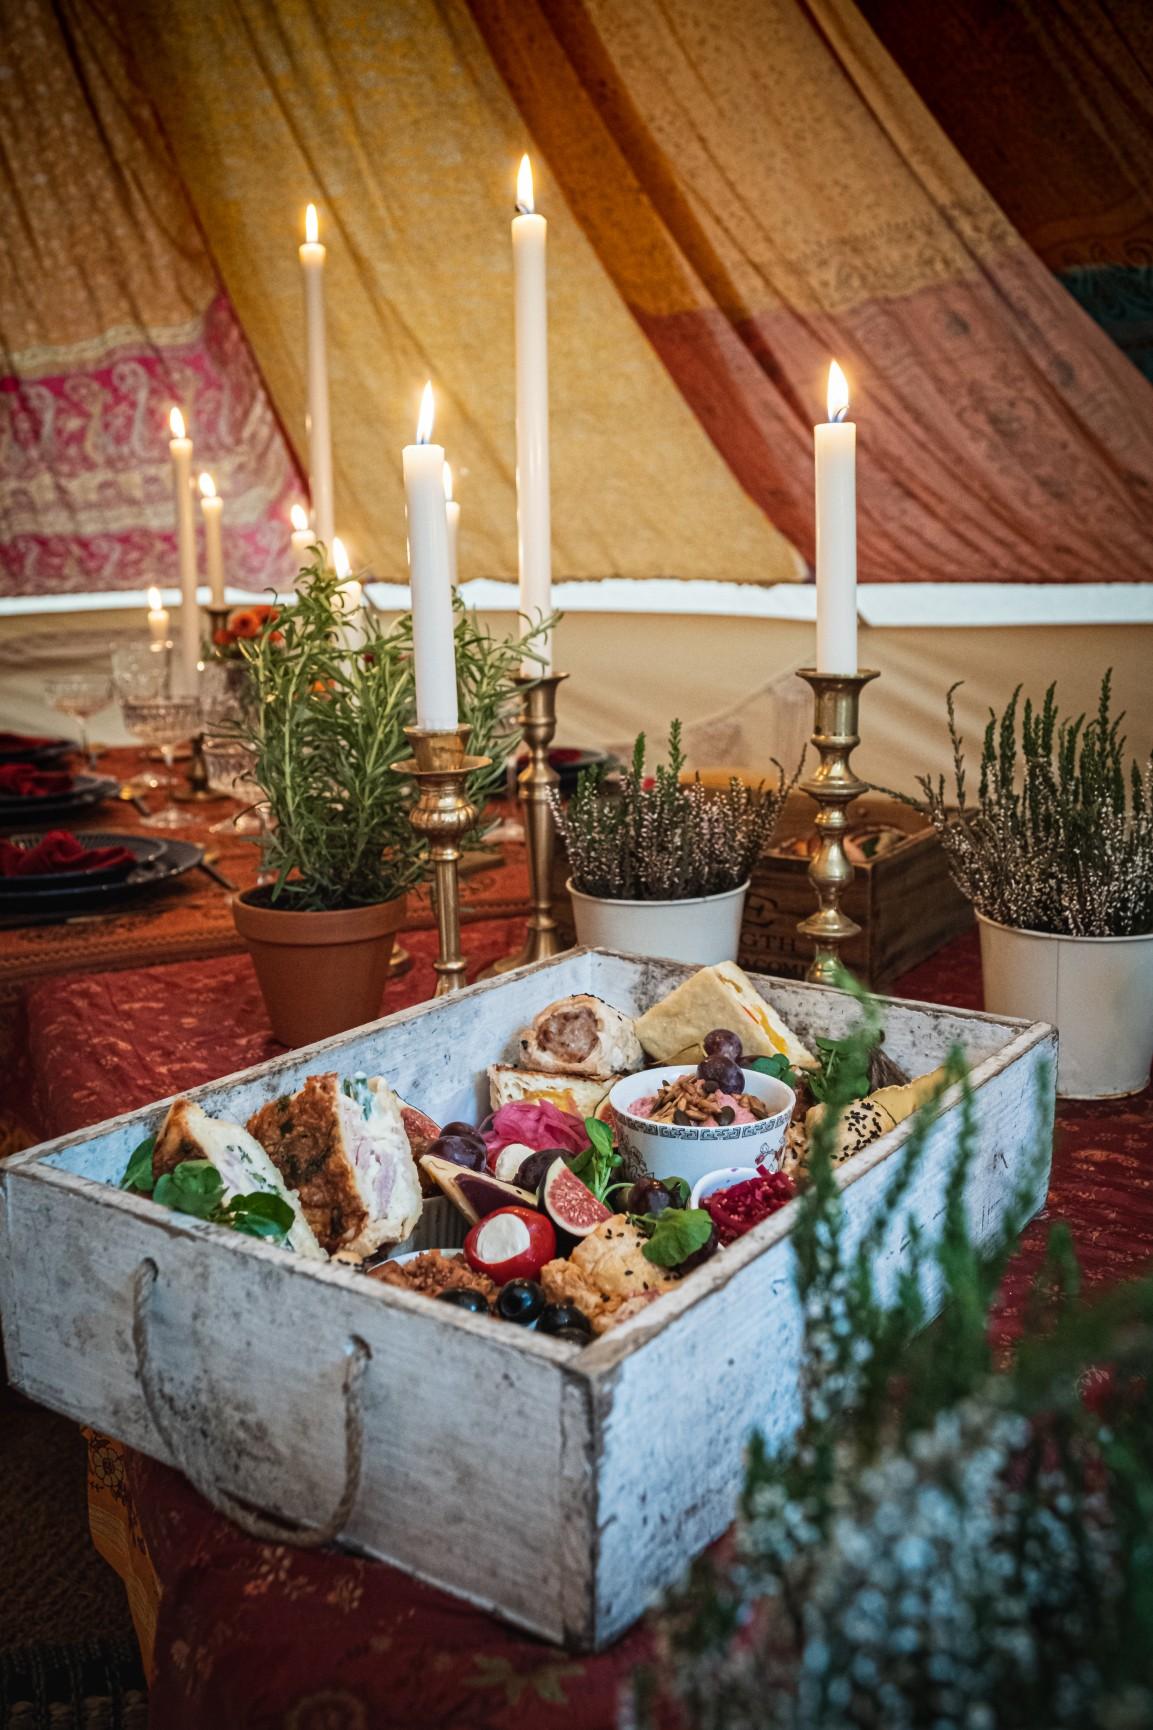 colourful micro wedding at patricks barn - wedding grazing table - wedding picnic - small wedding ideas